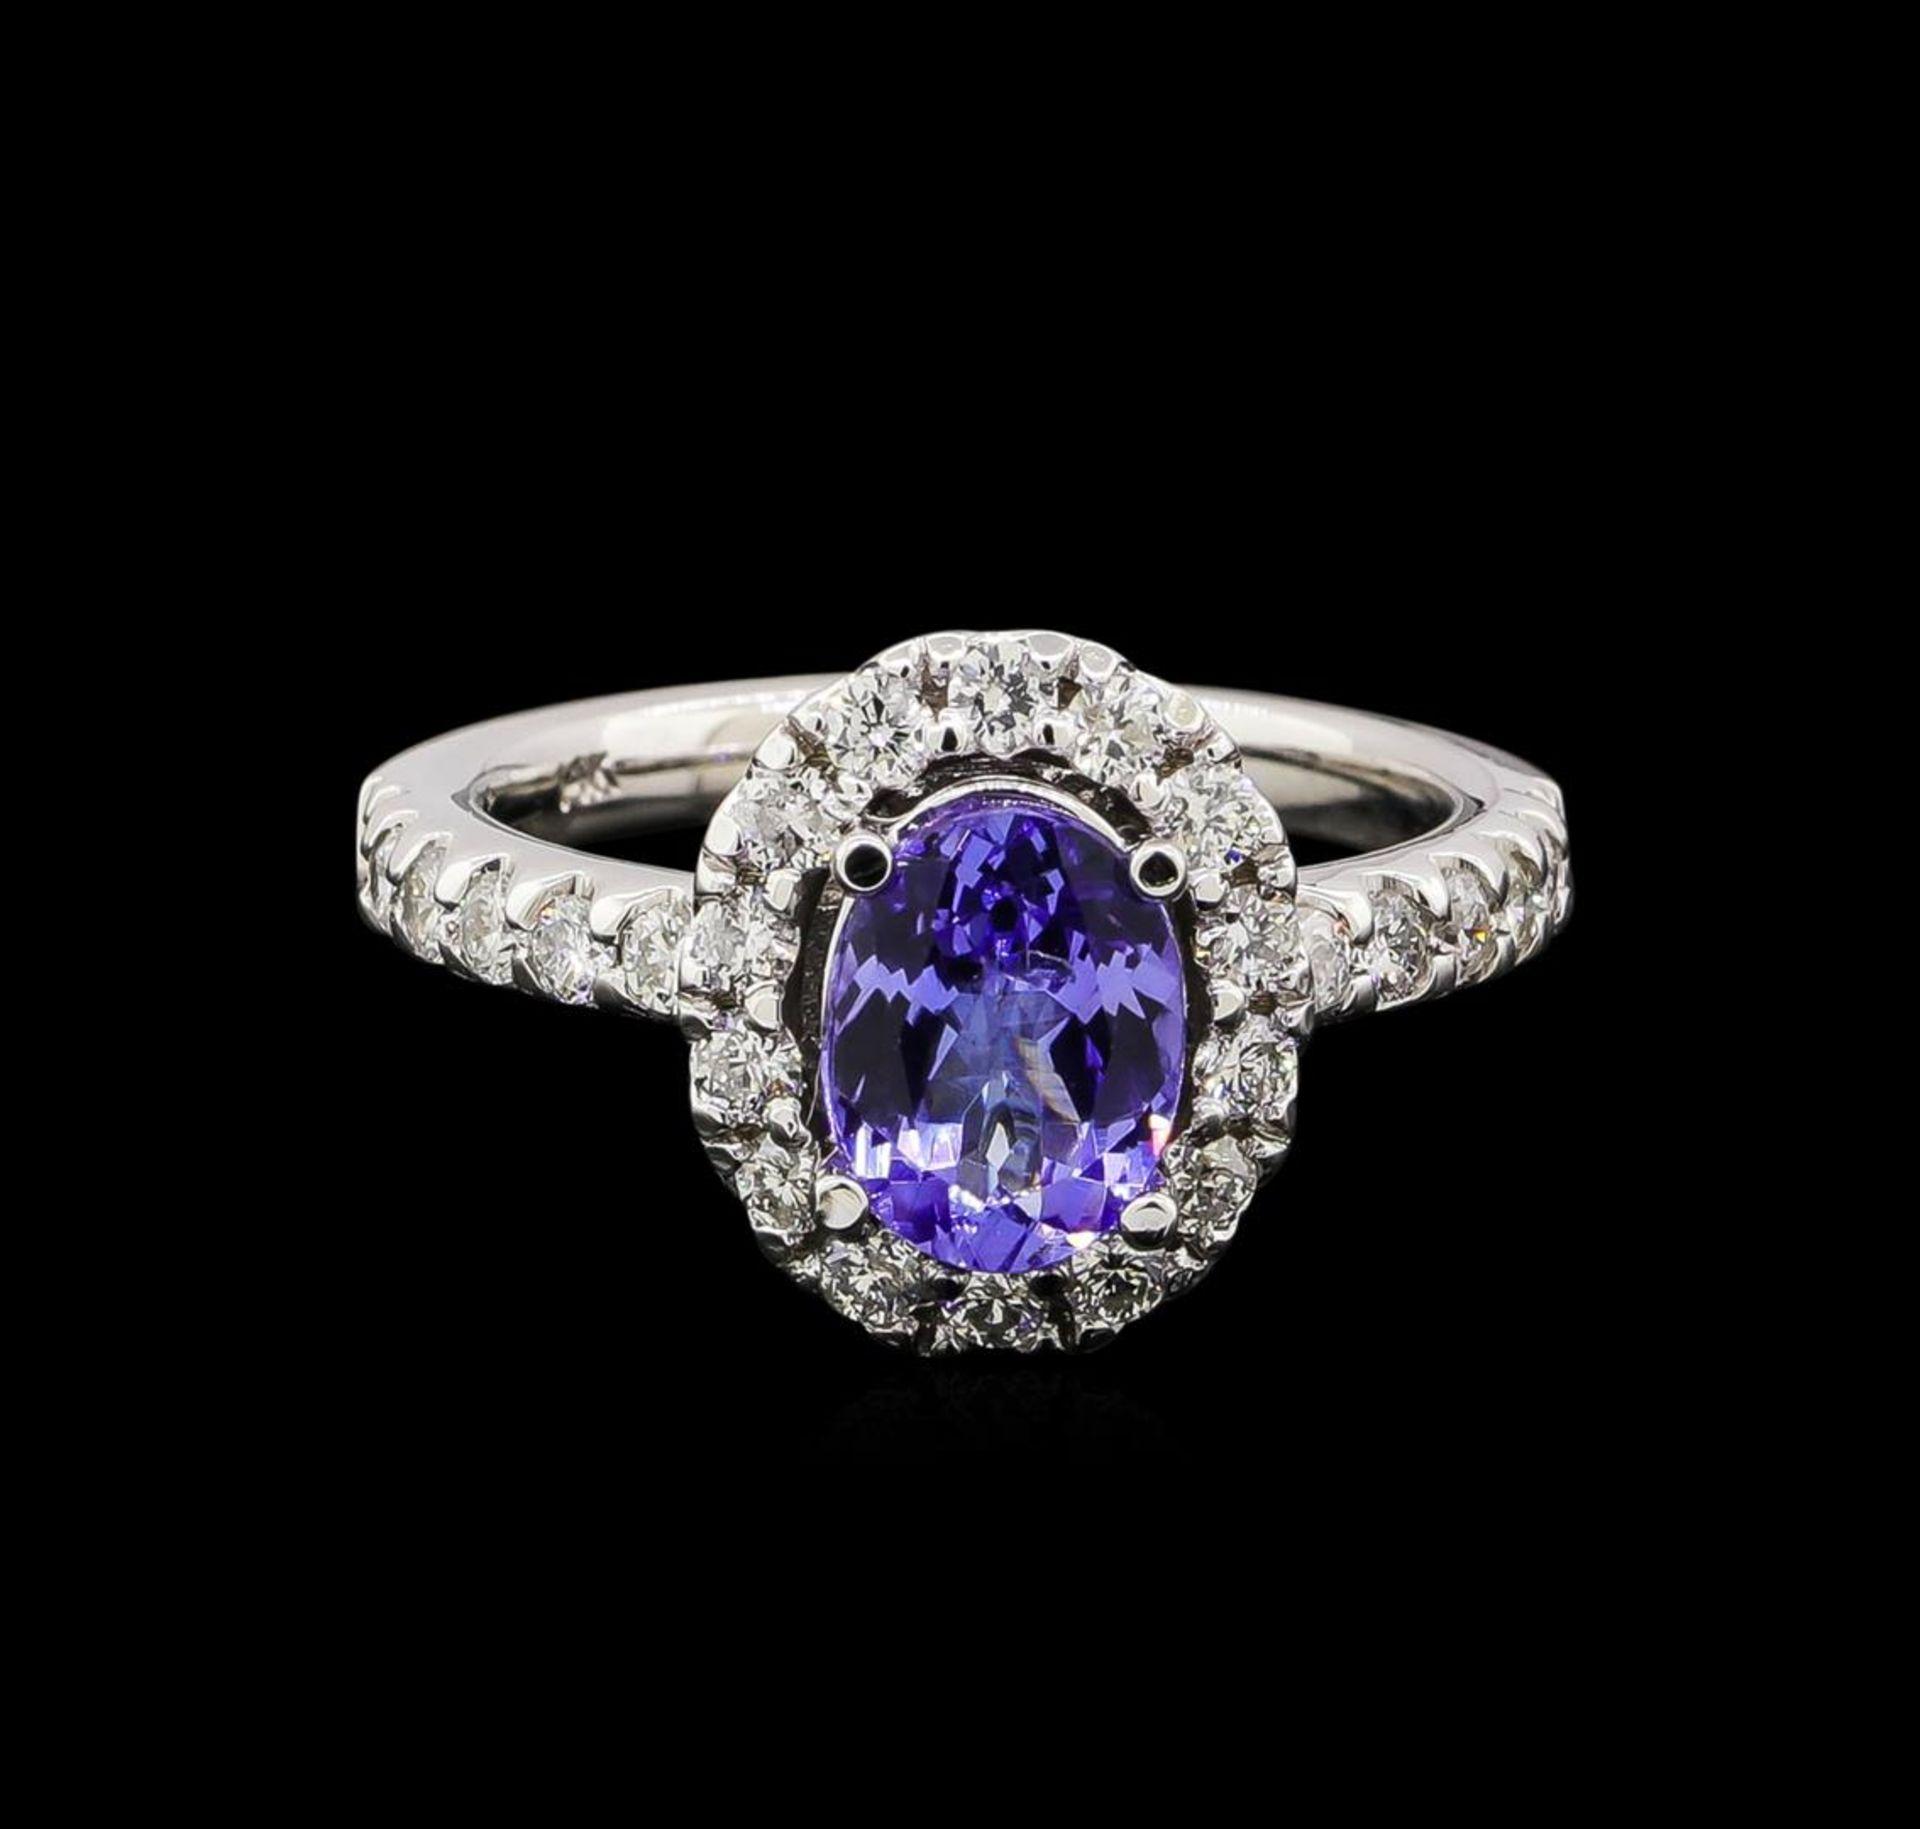 1.56 ctw Tanzanite and Diamond Ring - 14KT White Gold - Image 2 of 4